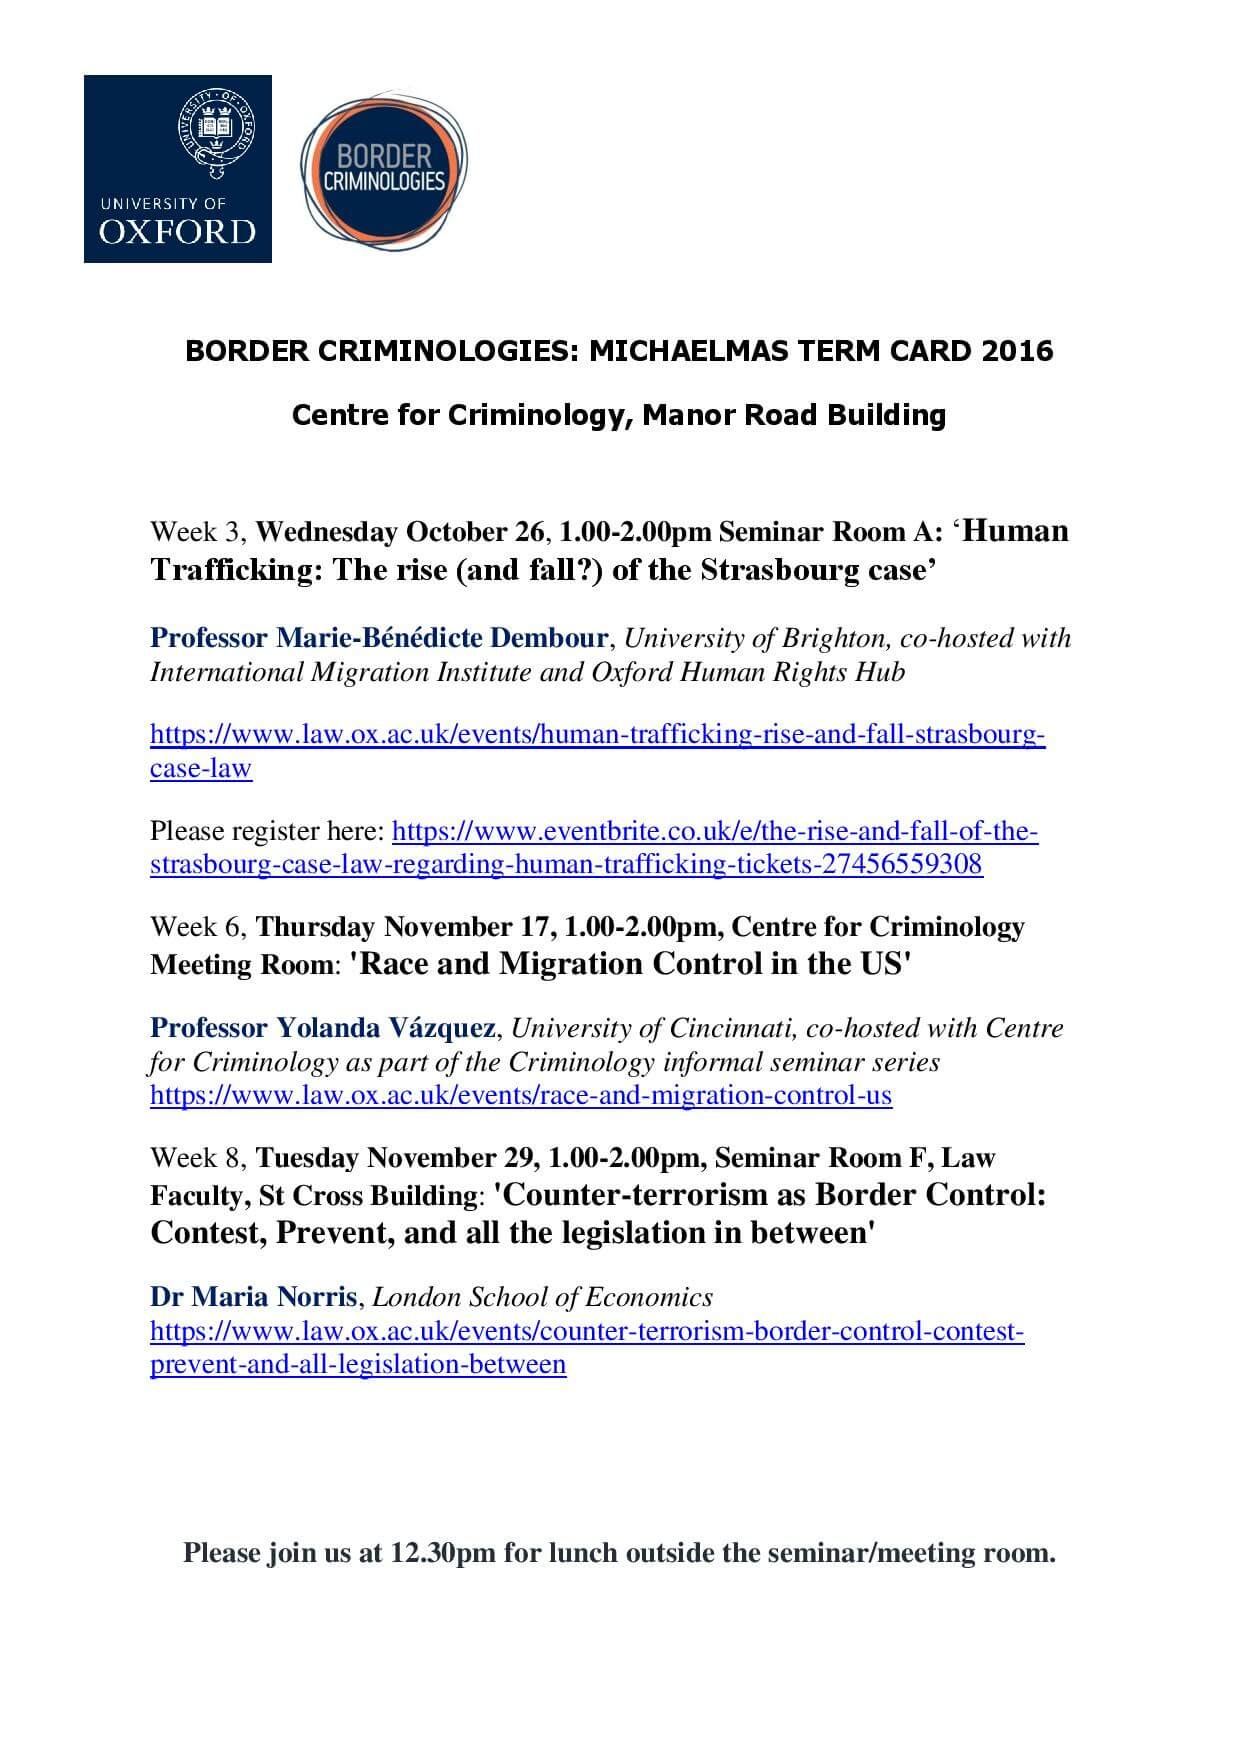 Border Criminologies Michaelmas Term Seminar Series